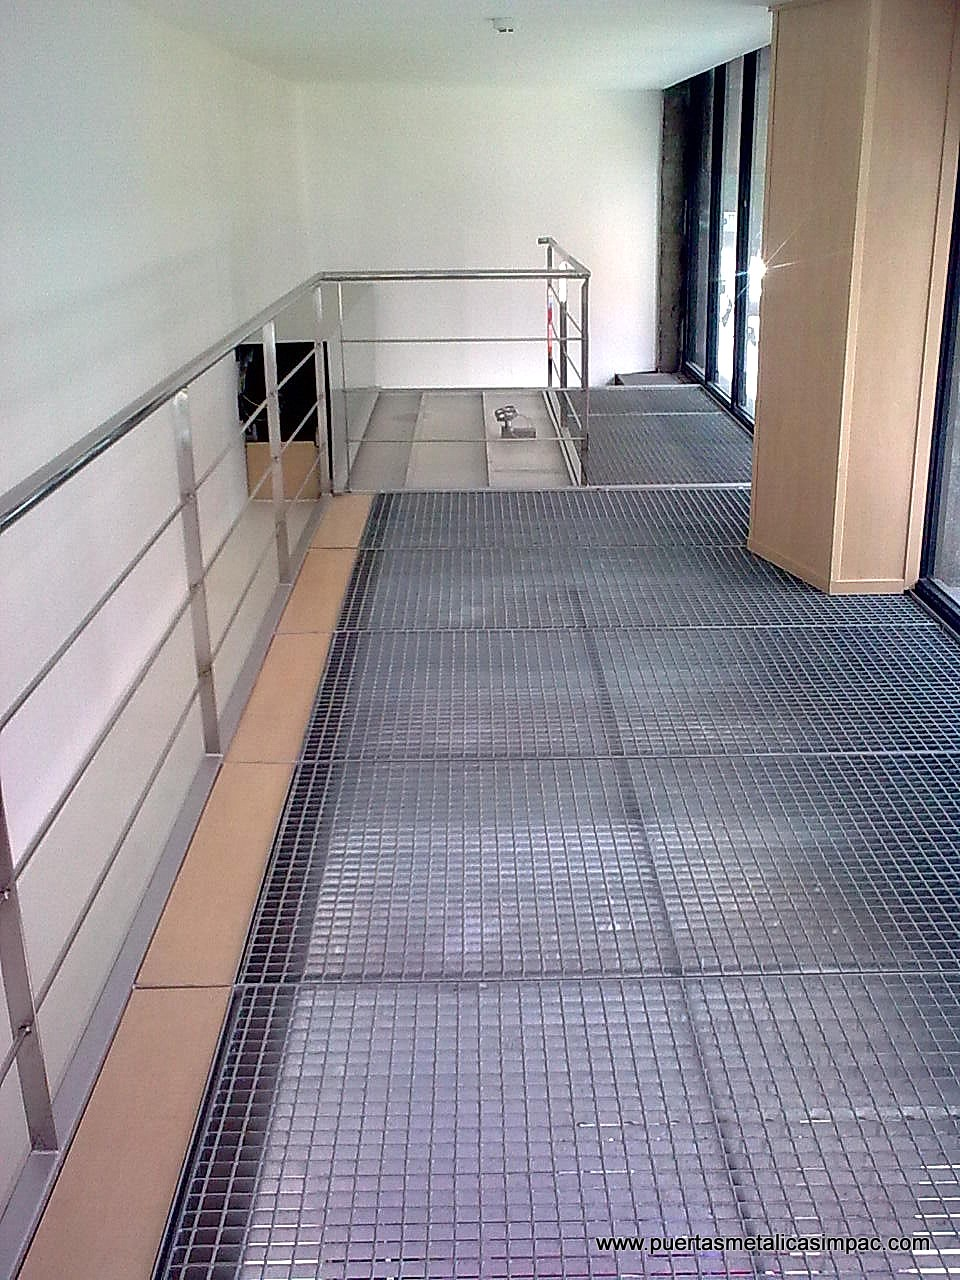 Cerrajeria impac s p c puertas met licas fabricaci n - Vallas para escaleras ...